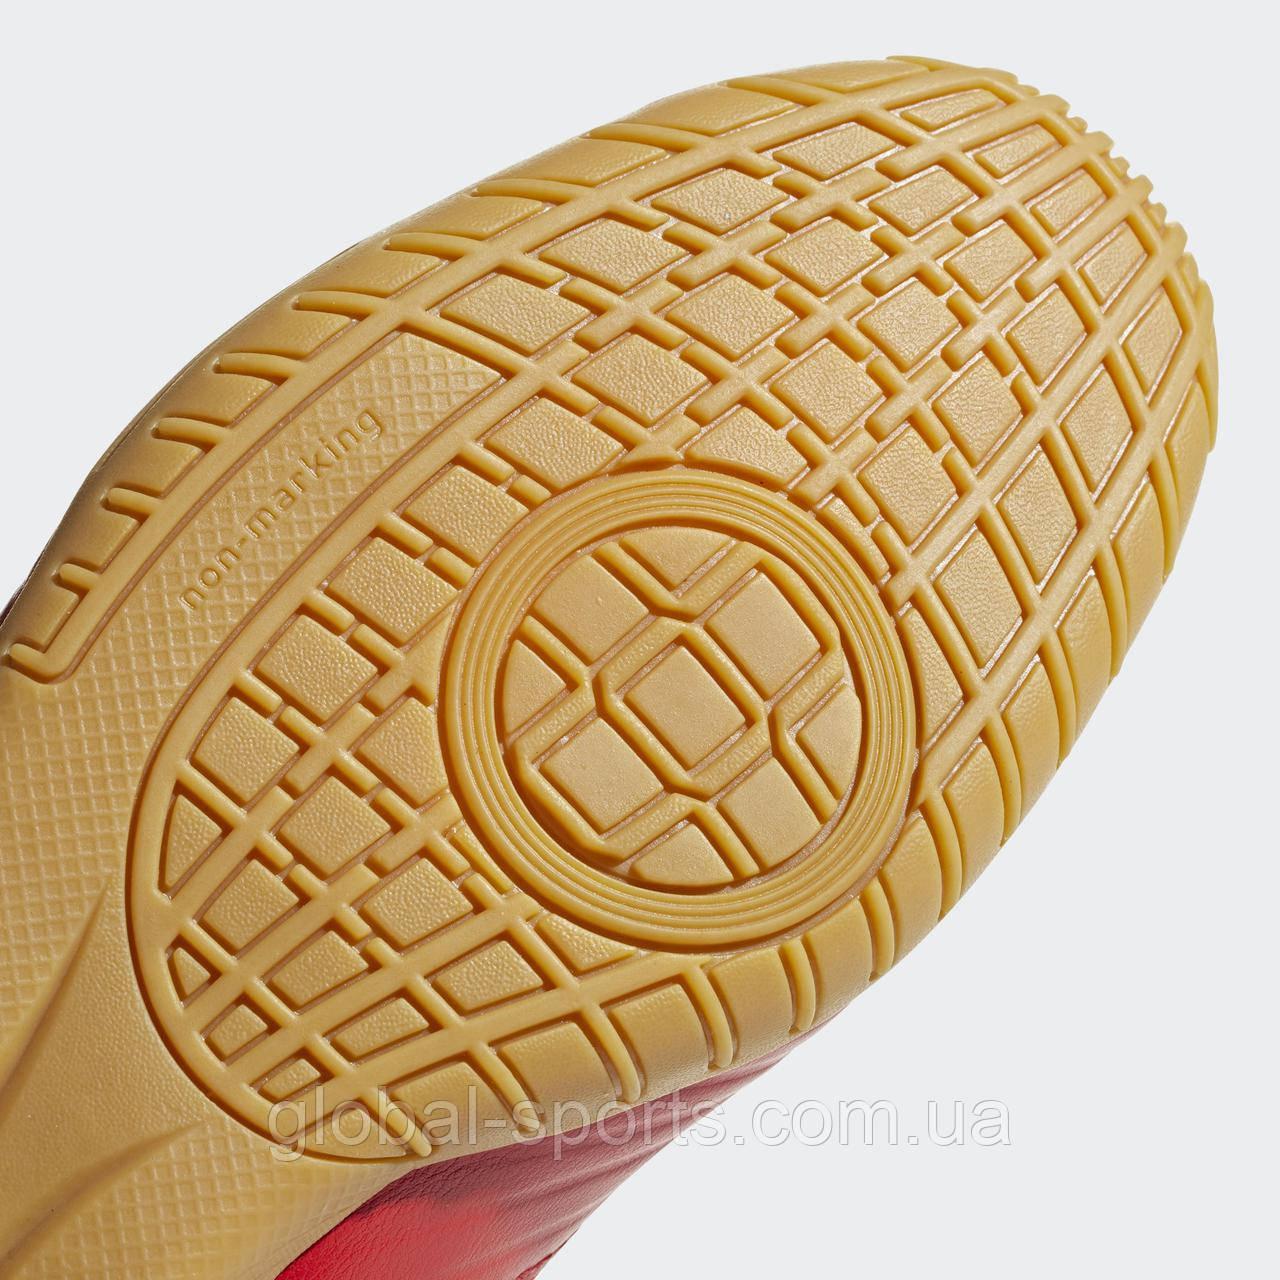 71a238d0 ... фото Мужские бутсы (футзалки) Adidas Predator 18.4 Sala(Артикул:DB2172),  ...